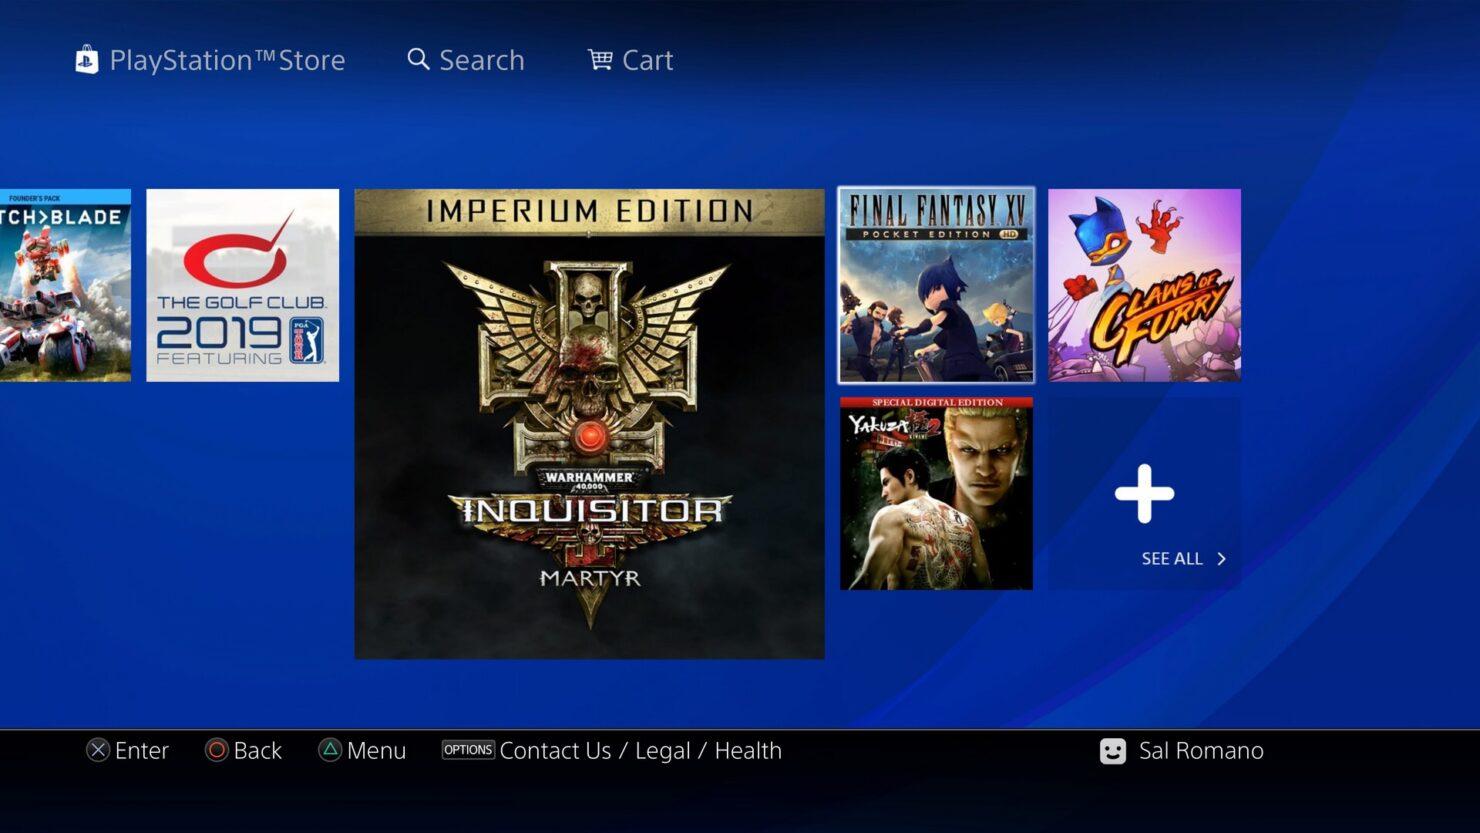 final fantasy XV pocket edition ps4 HD icon ps store